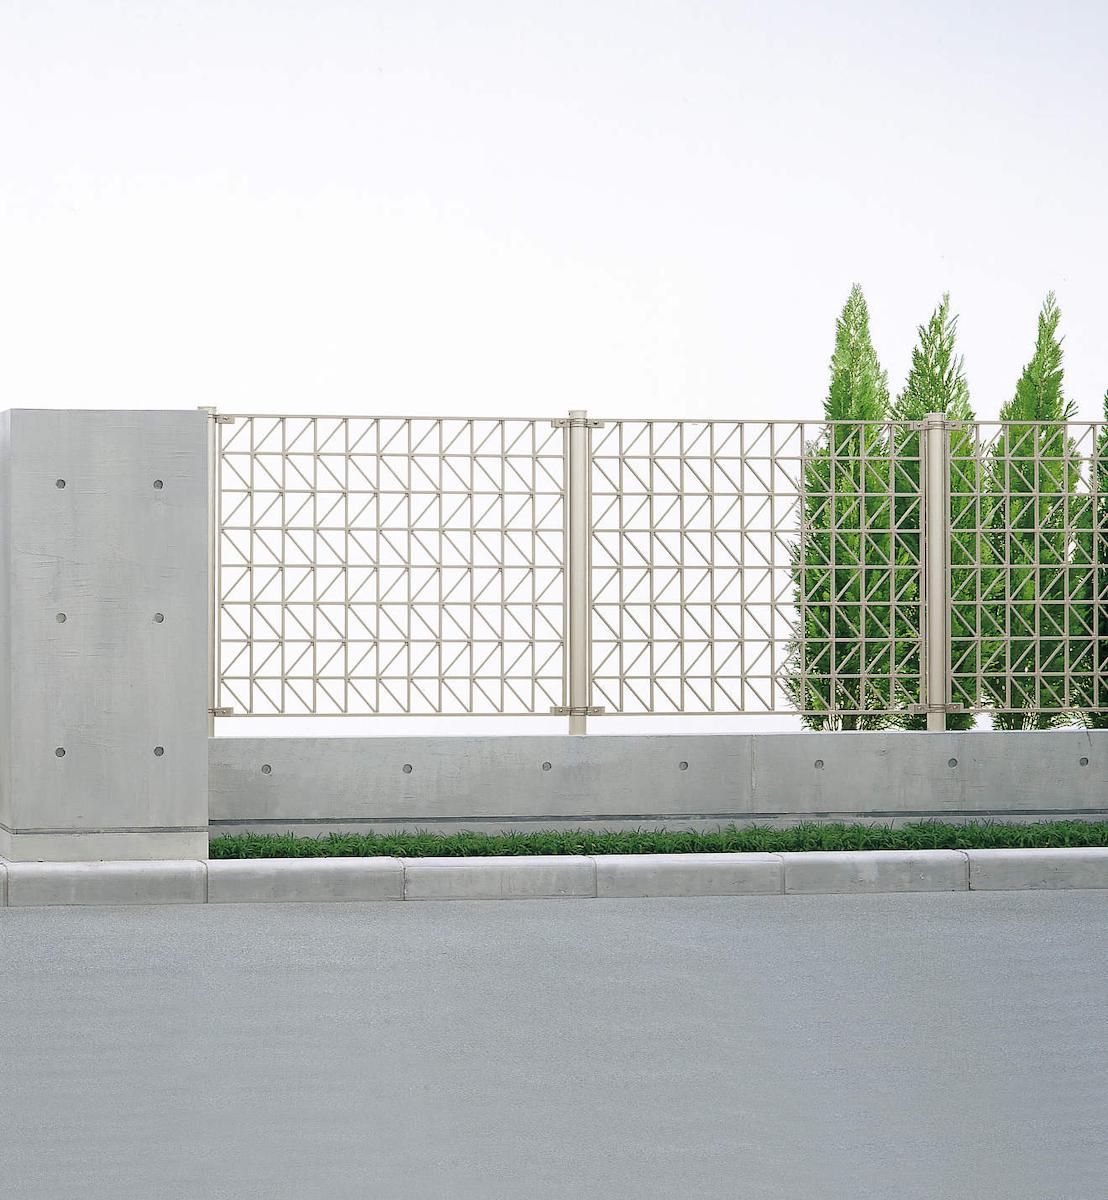 YKKAPガーデンエクステリア フェンス シャローネ SM02型 連結用セット品:[幅1200mm×高1000mm]